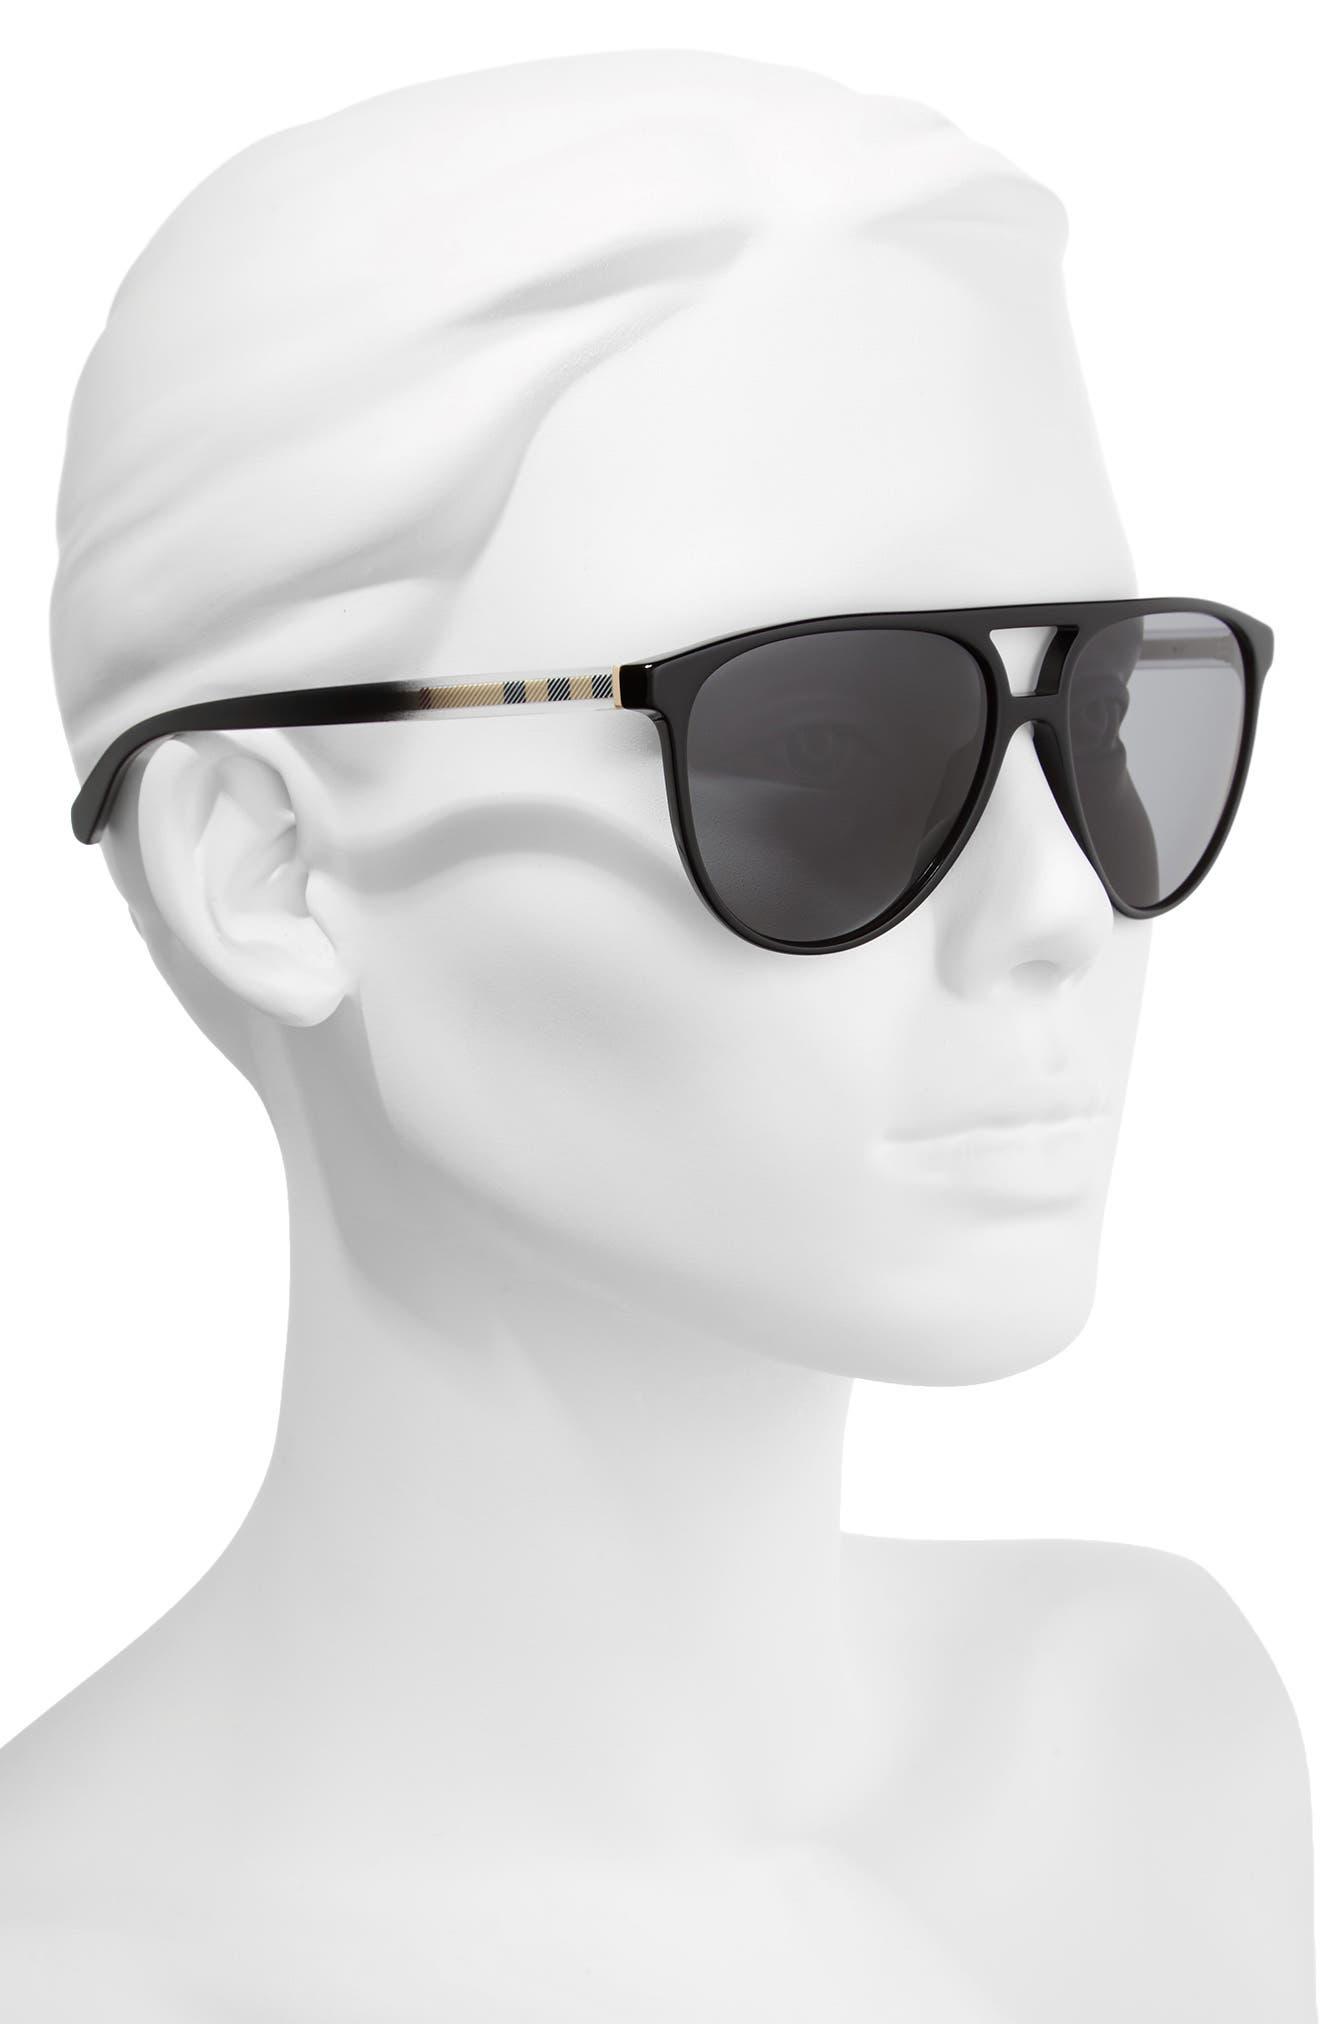 58mm Polarized Aviator Sunglasses,                             Alternate thumbnail 2, color,                             Black/ Polar